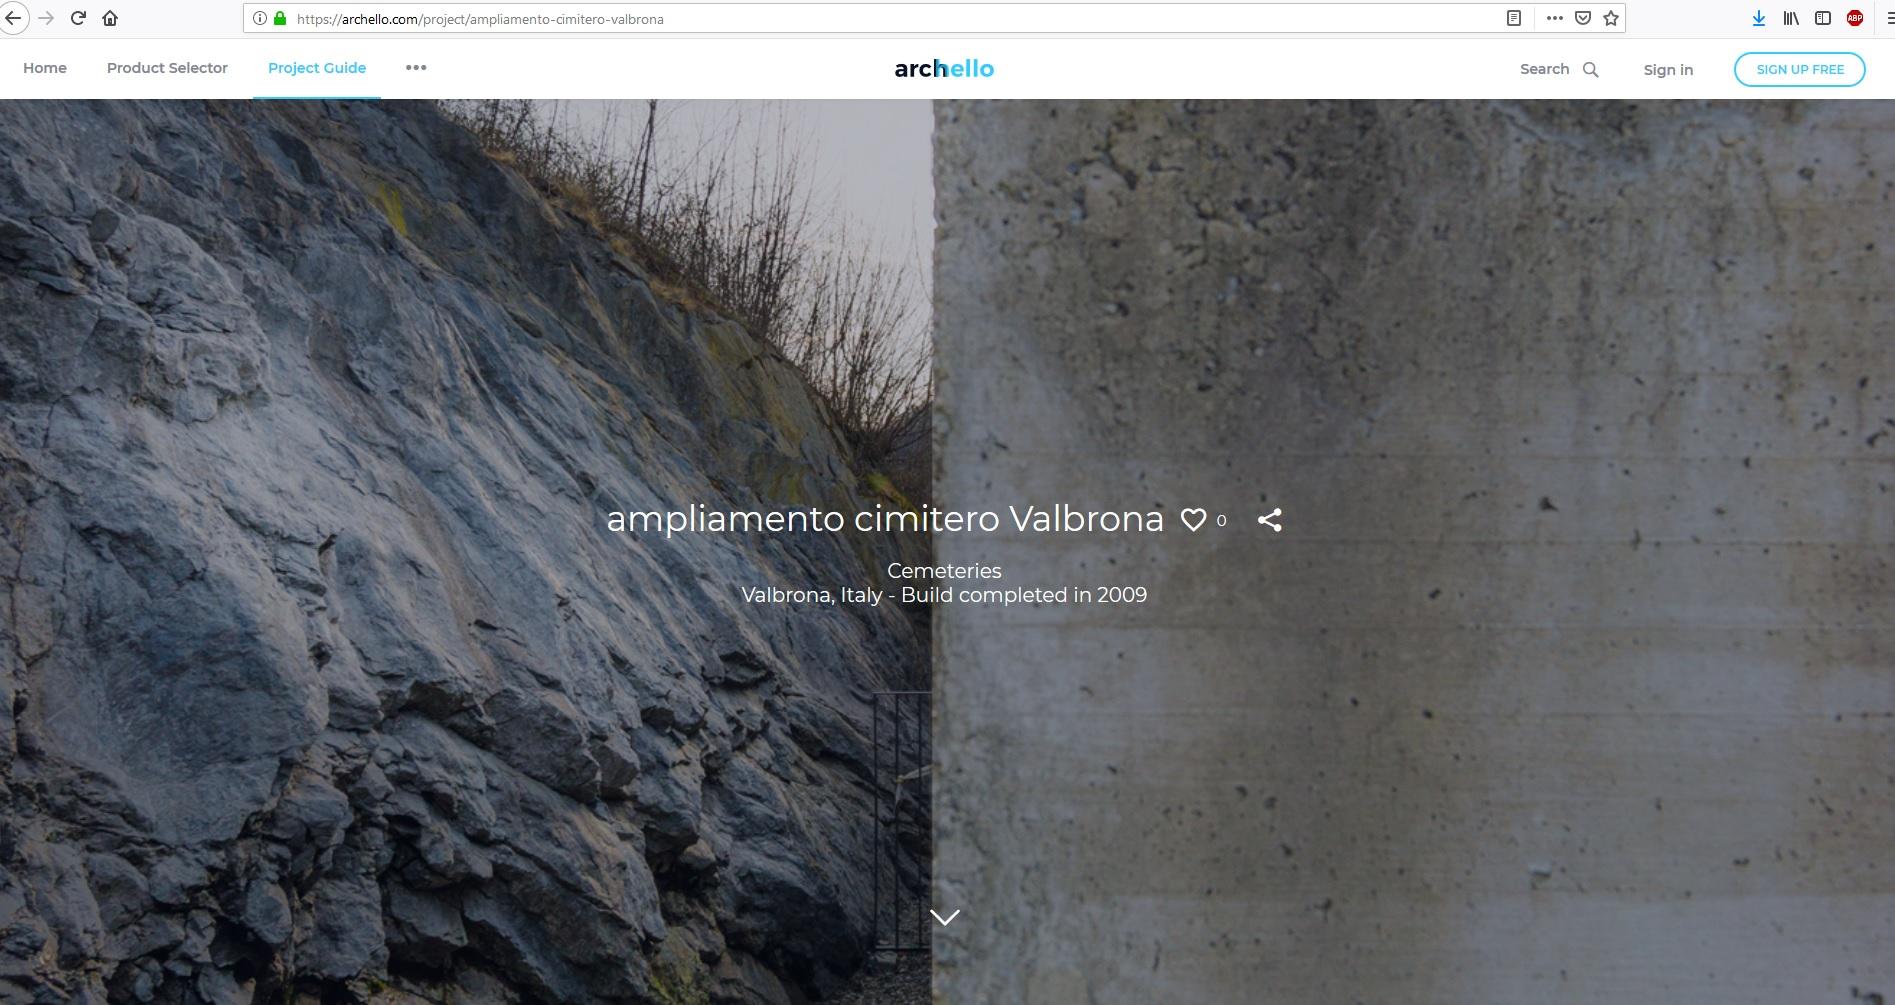 ARCHELLO 2.jpg